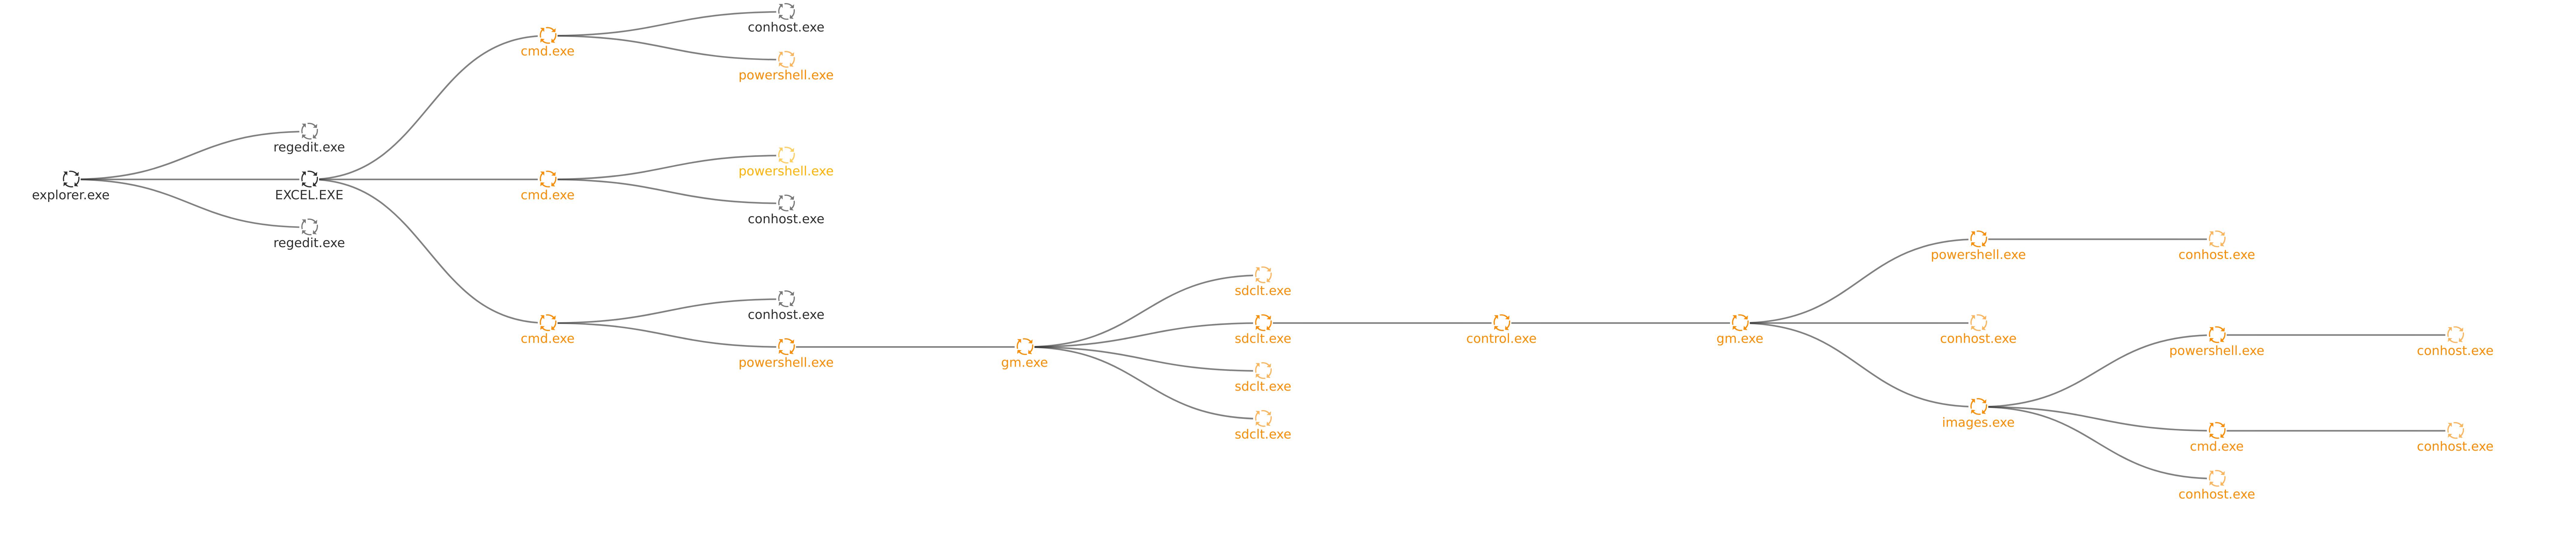 Uptycs process graph.